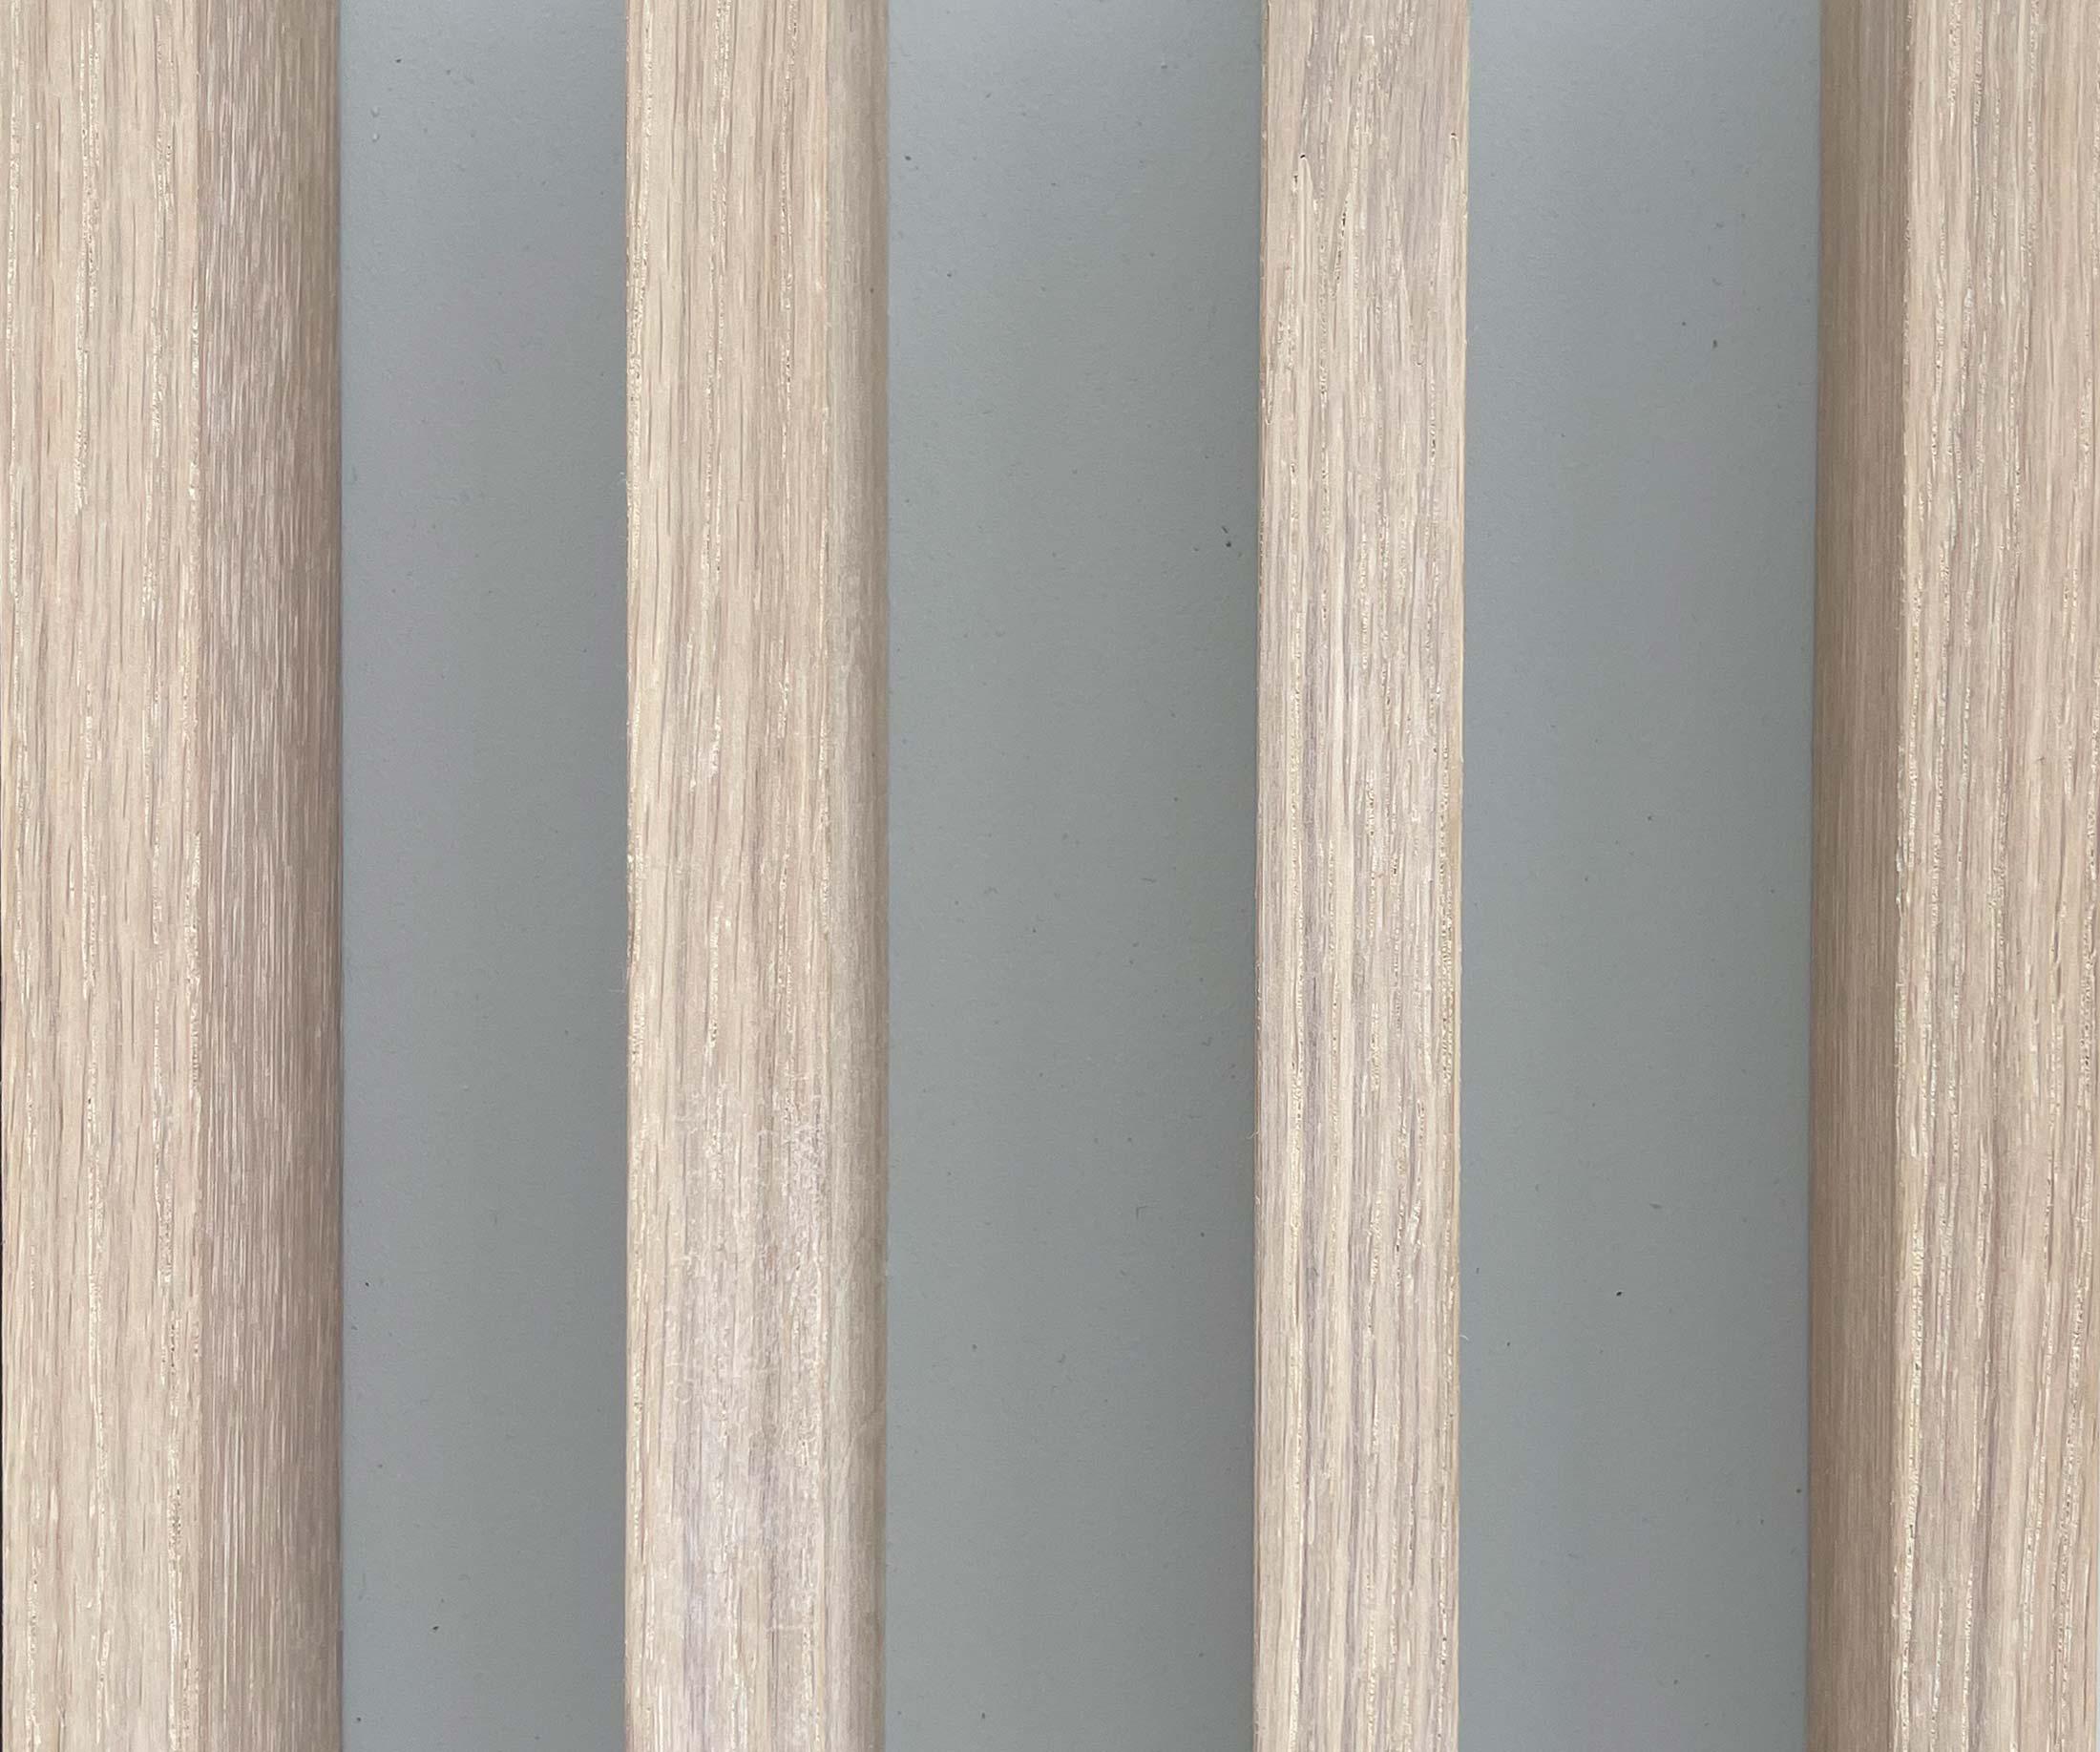 wandpaneele-akustik-eiche-furnier-zaun-koenig-white-2